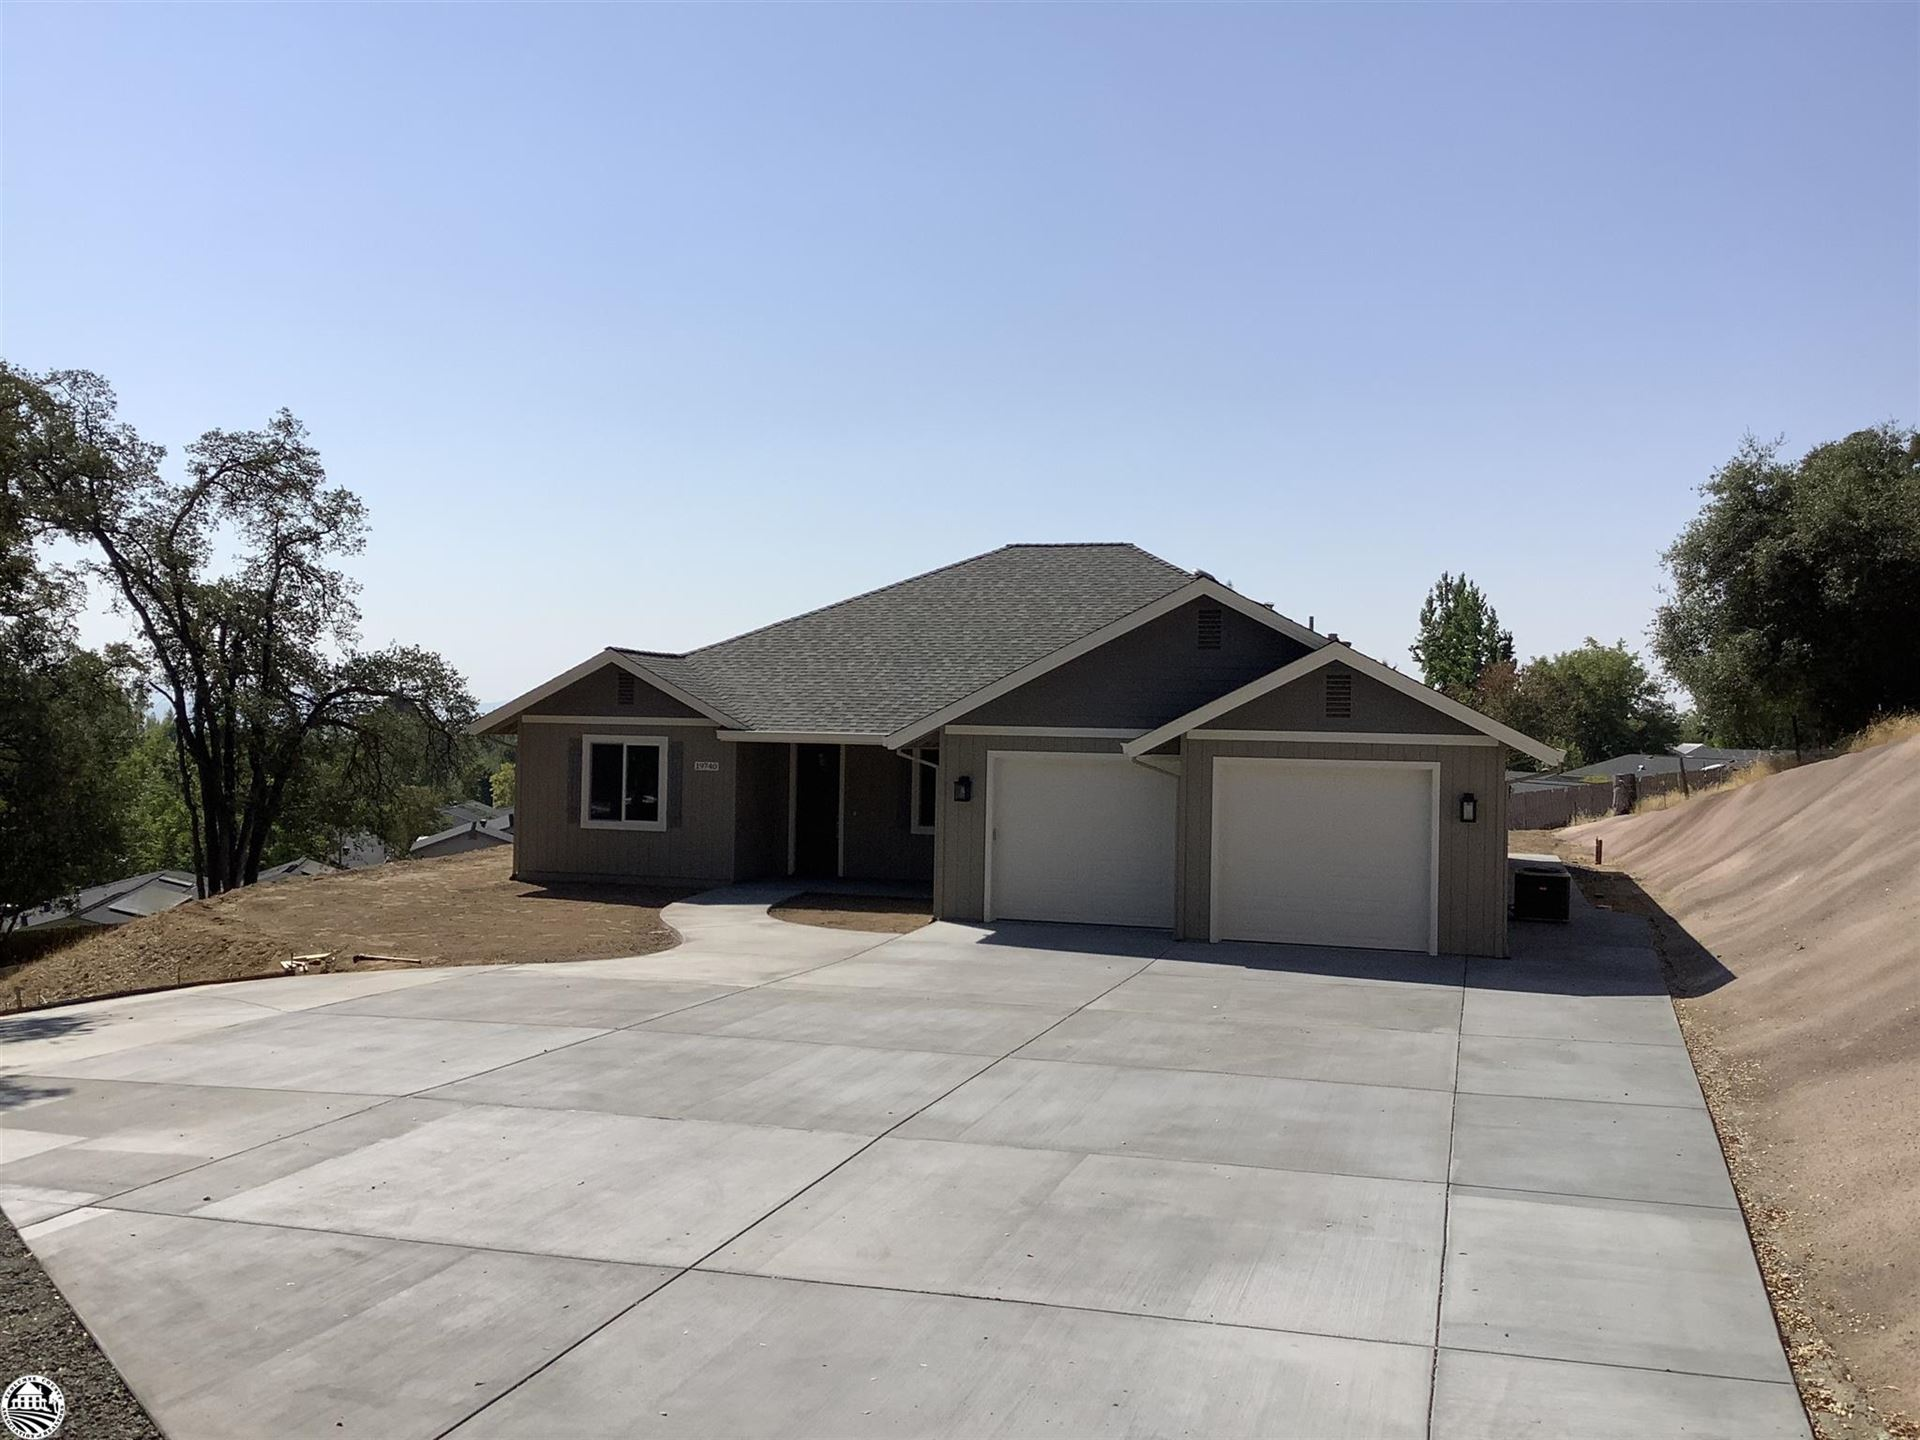 19740 Cedar Rd, Sonora, CA 95370 - MLS#: 20200615